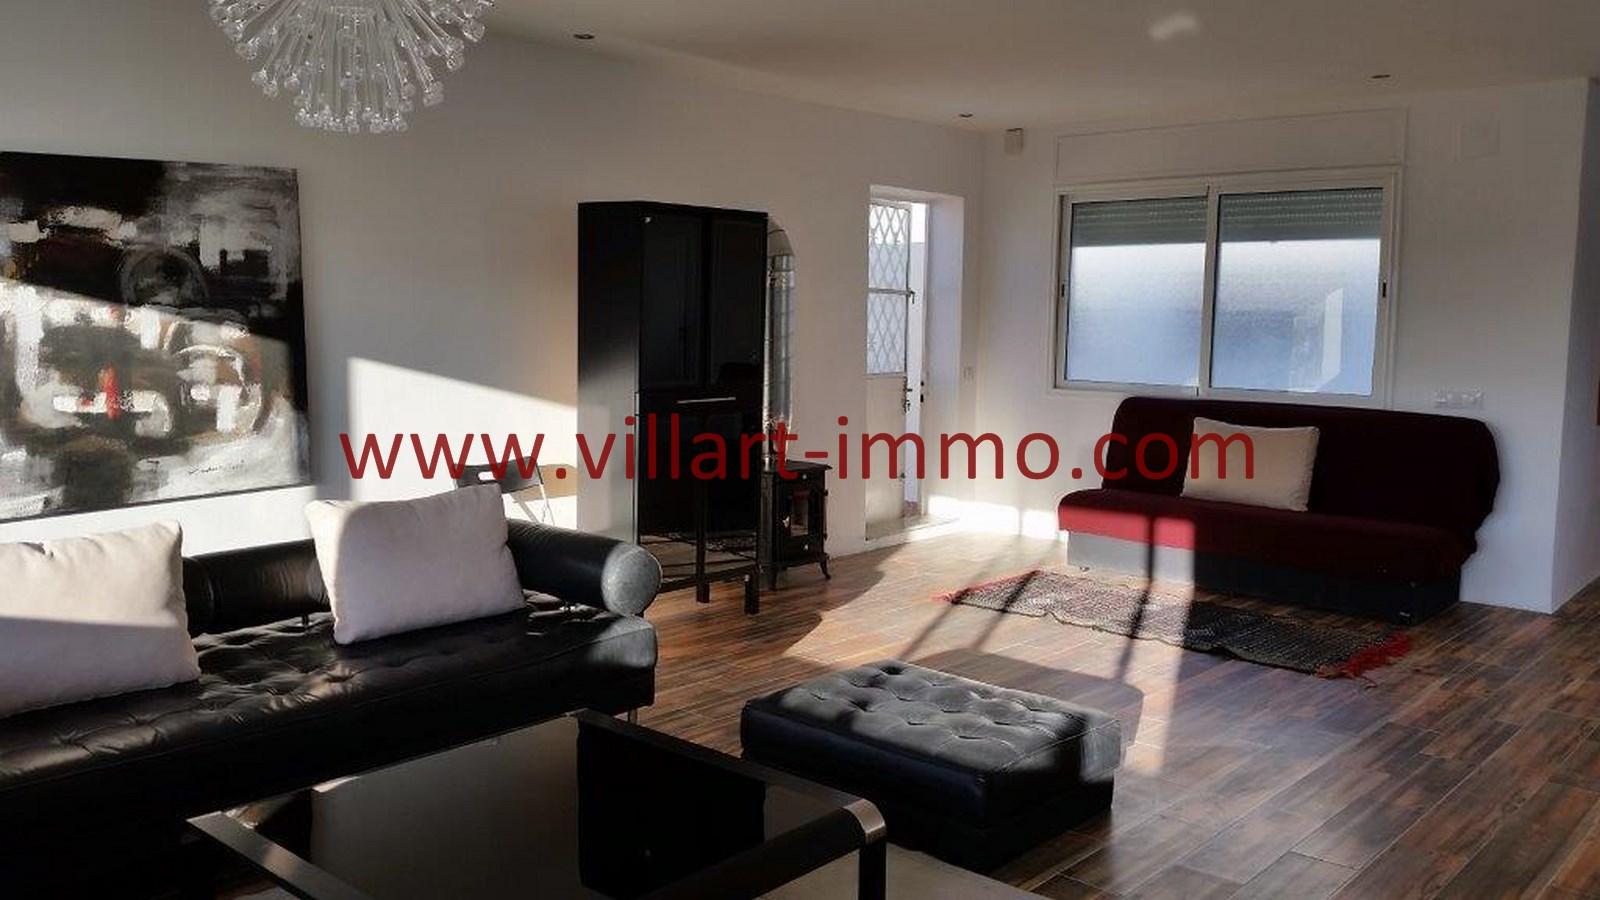 5-Vente-Appartement-Tanger-Centre-De-Ville-Salon 3-VA518-Villart Immo